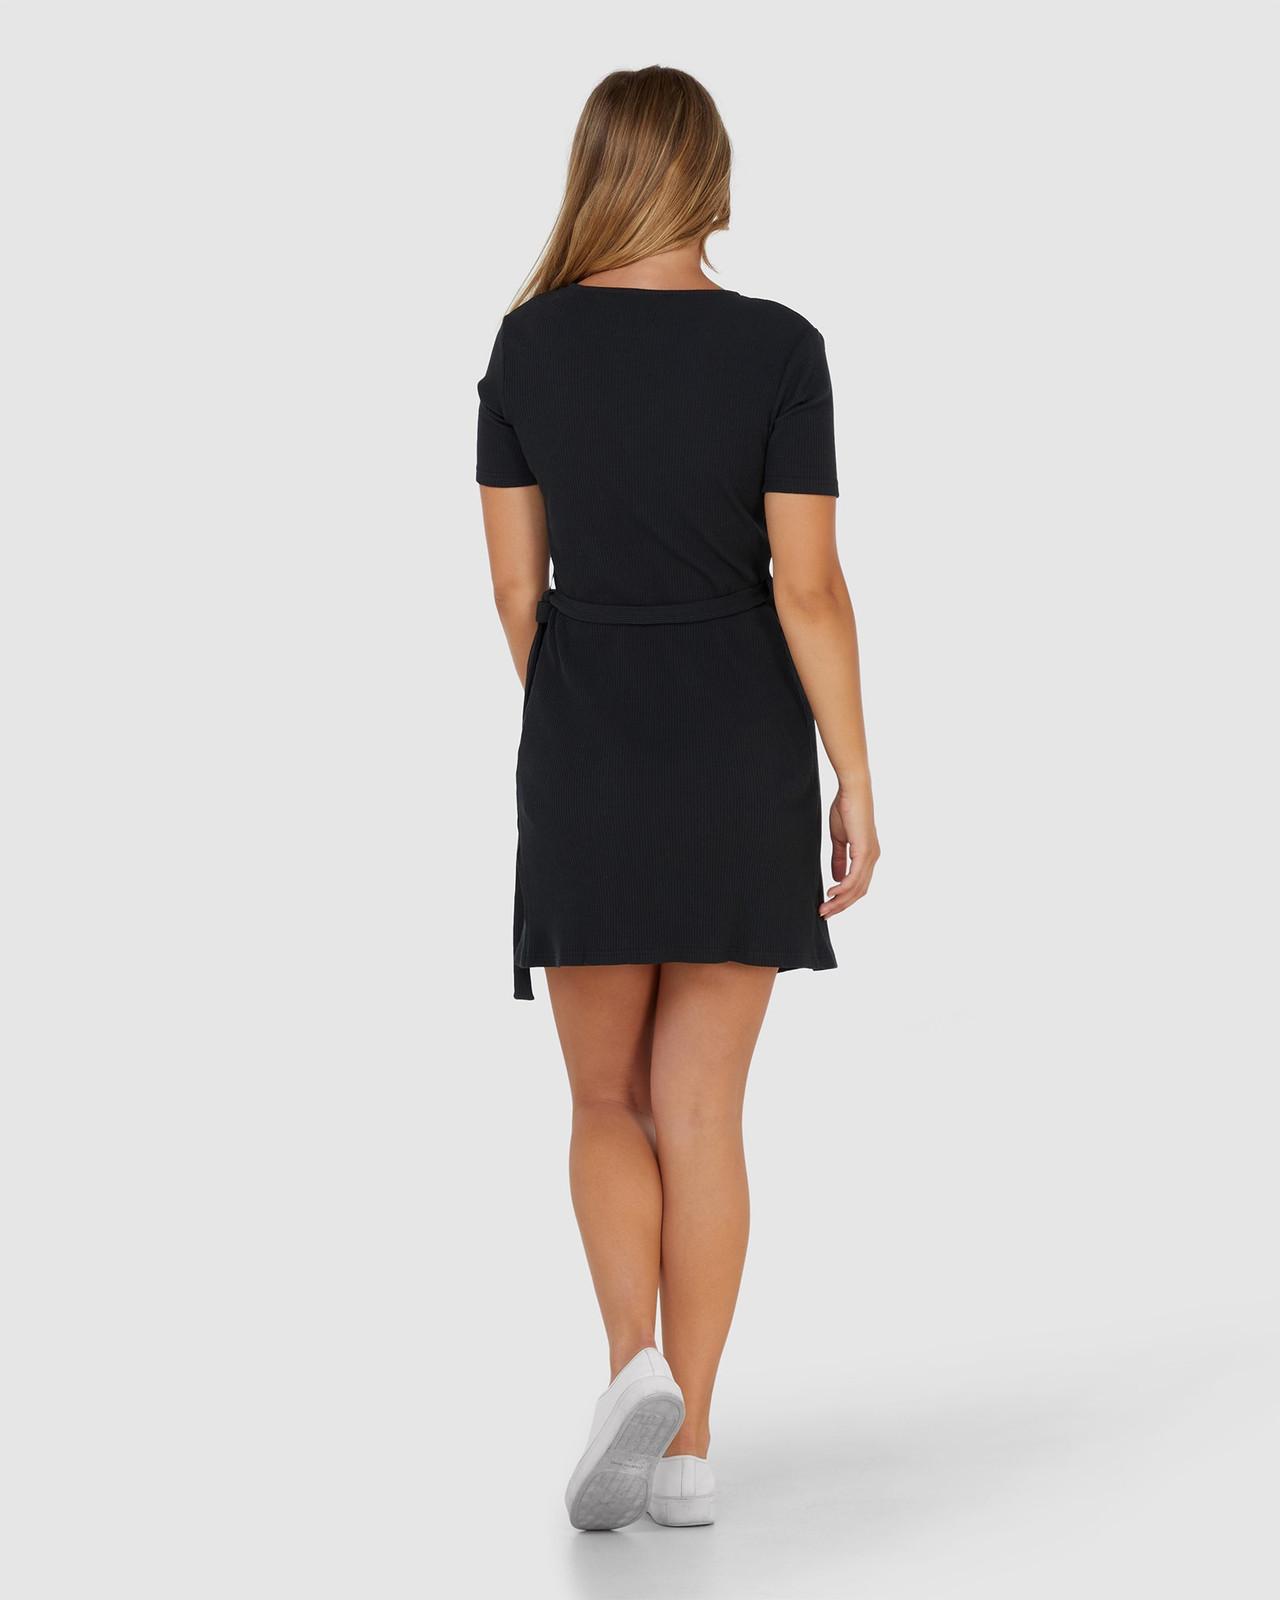 Elwood Womens Amelia Wrap Dress Black